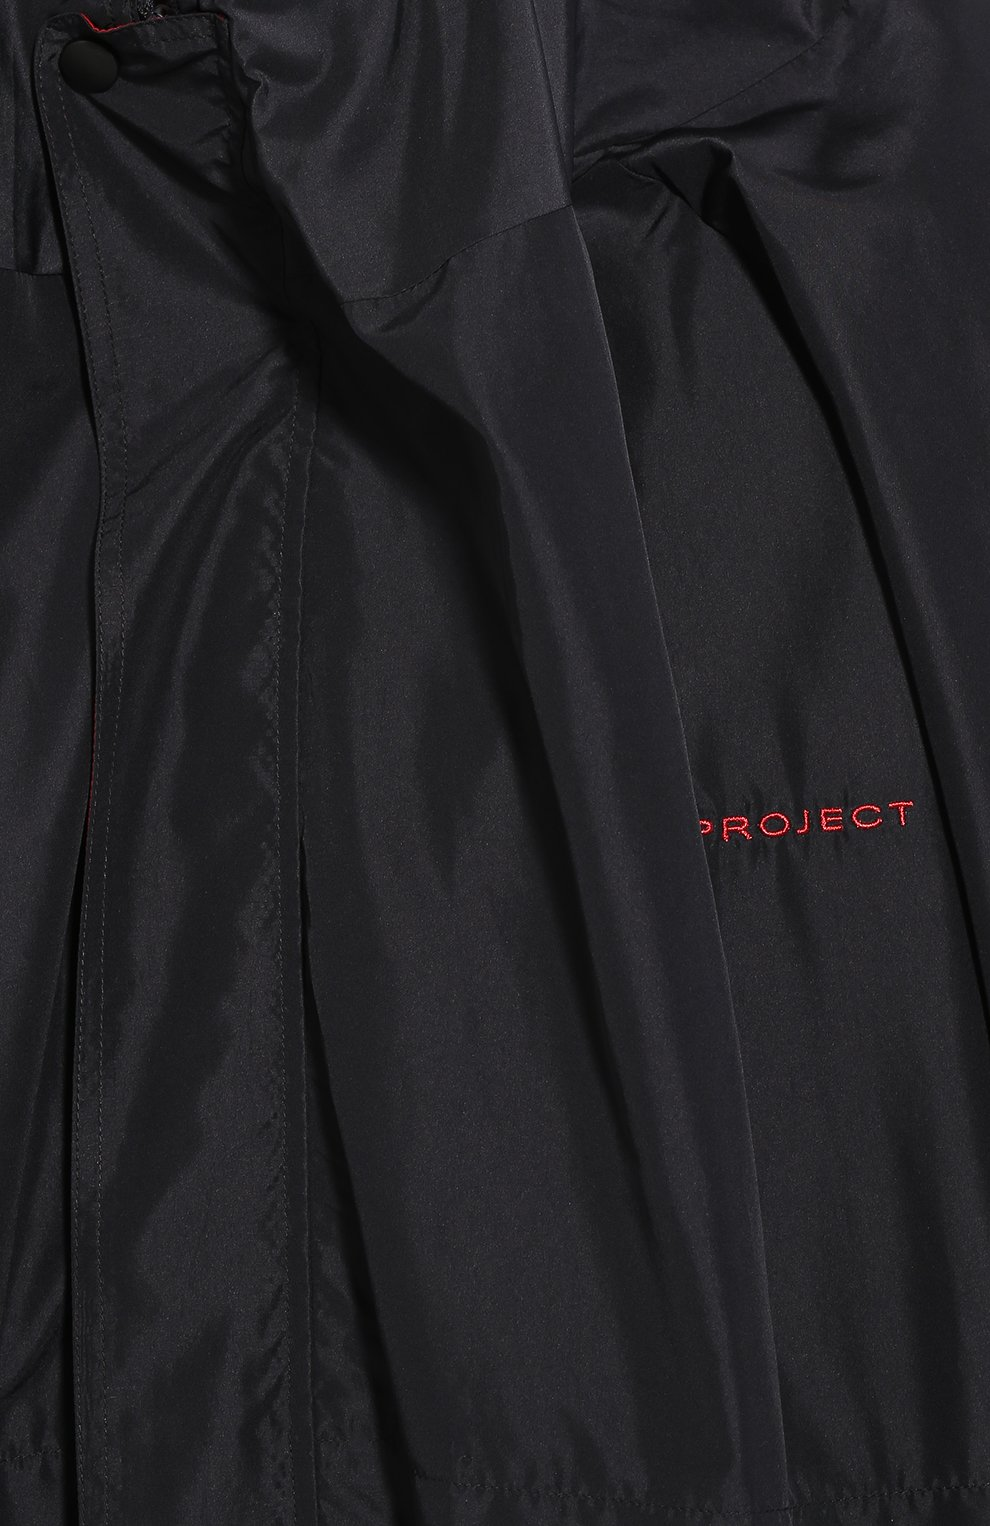 Мужская куртка Y/PROJECT синего цвета, арт. JACK64-S18 F121   Фото 5